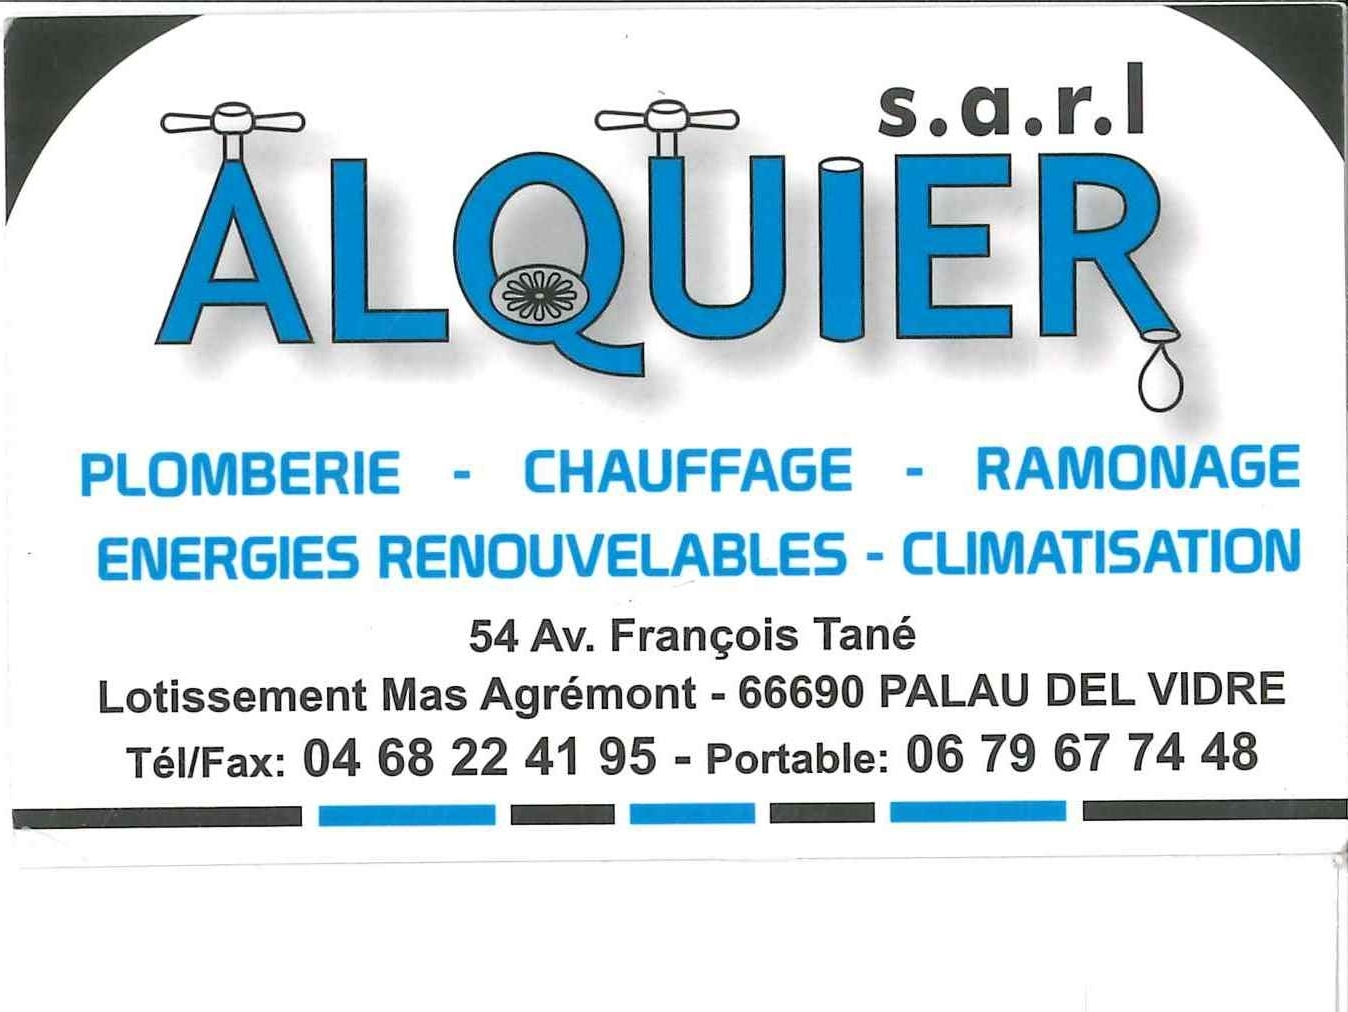 SARL ALQUIER